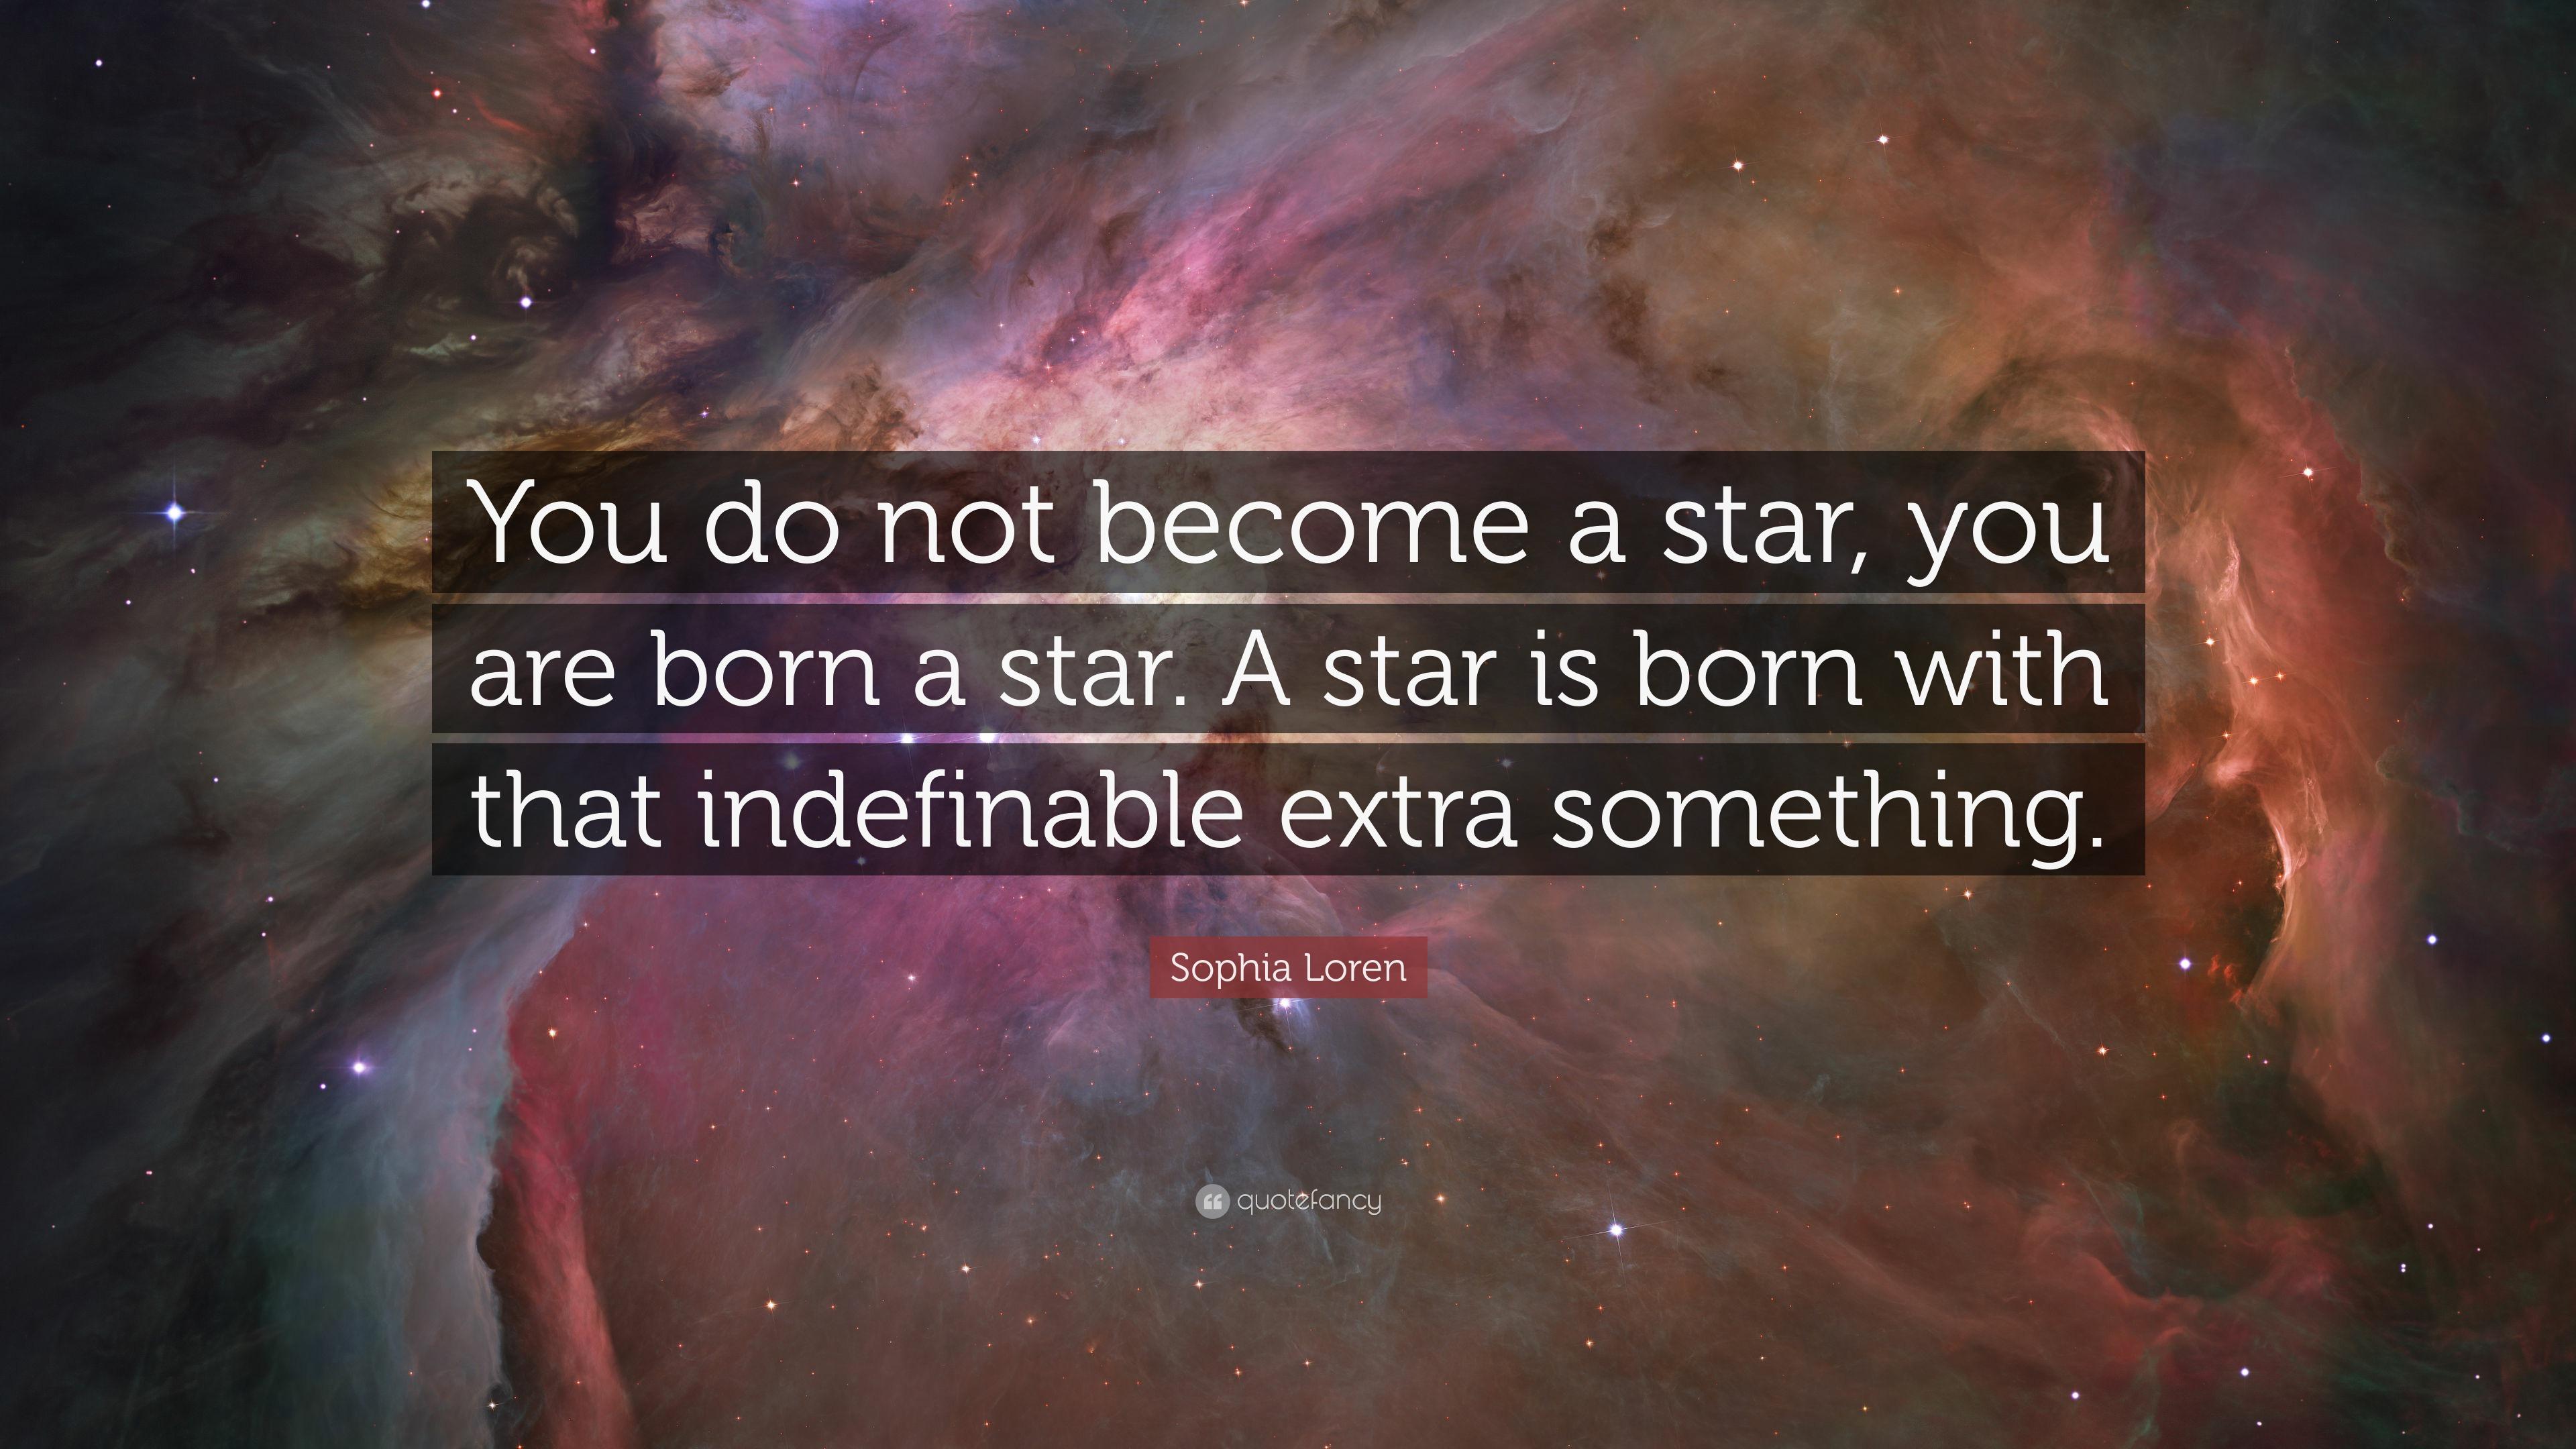 were/are you born here?